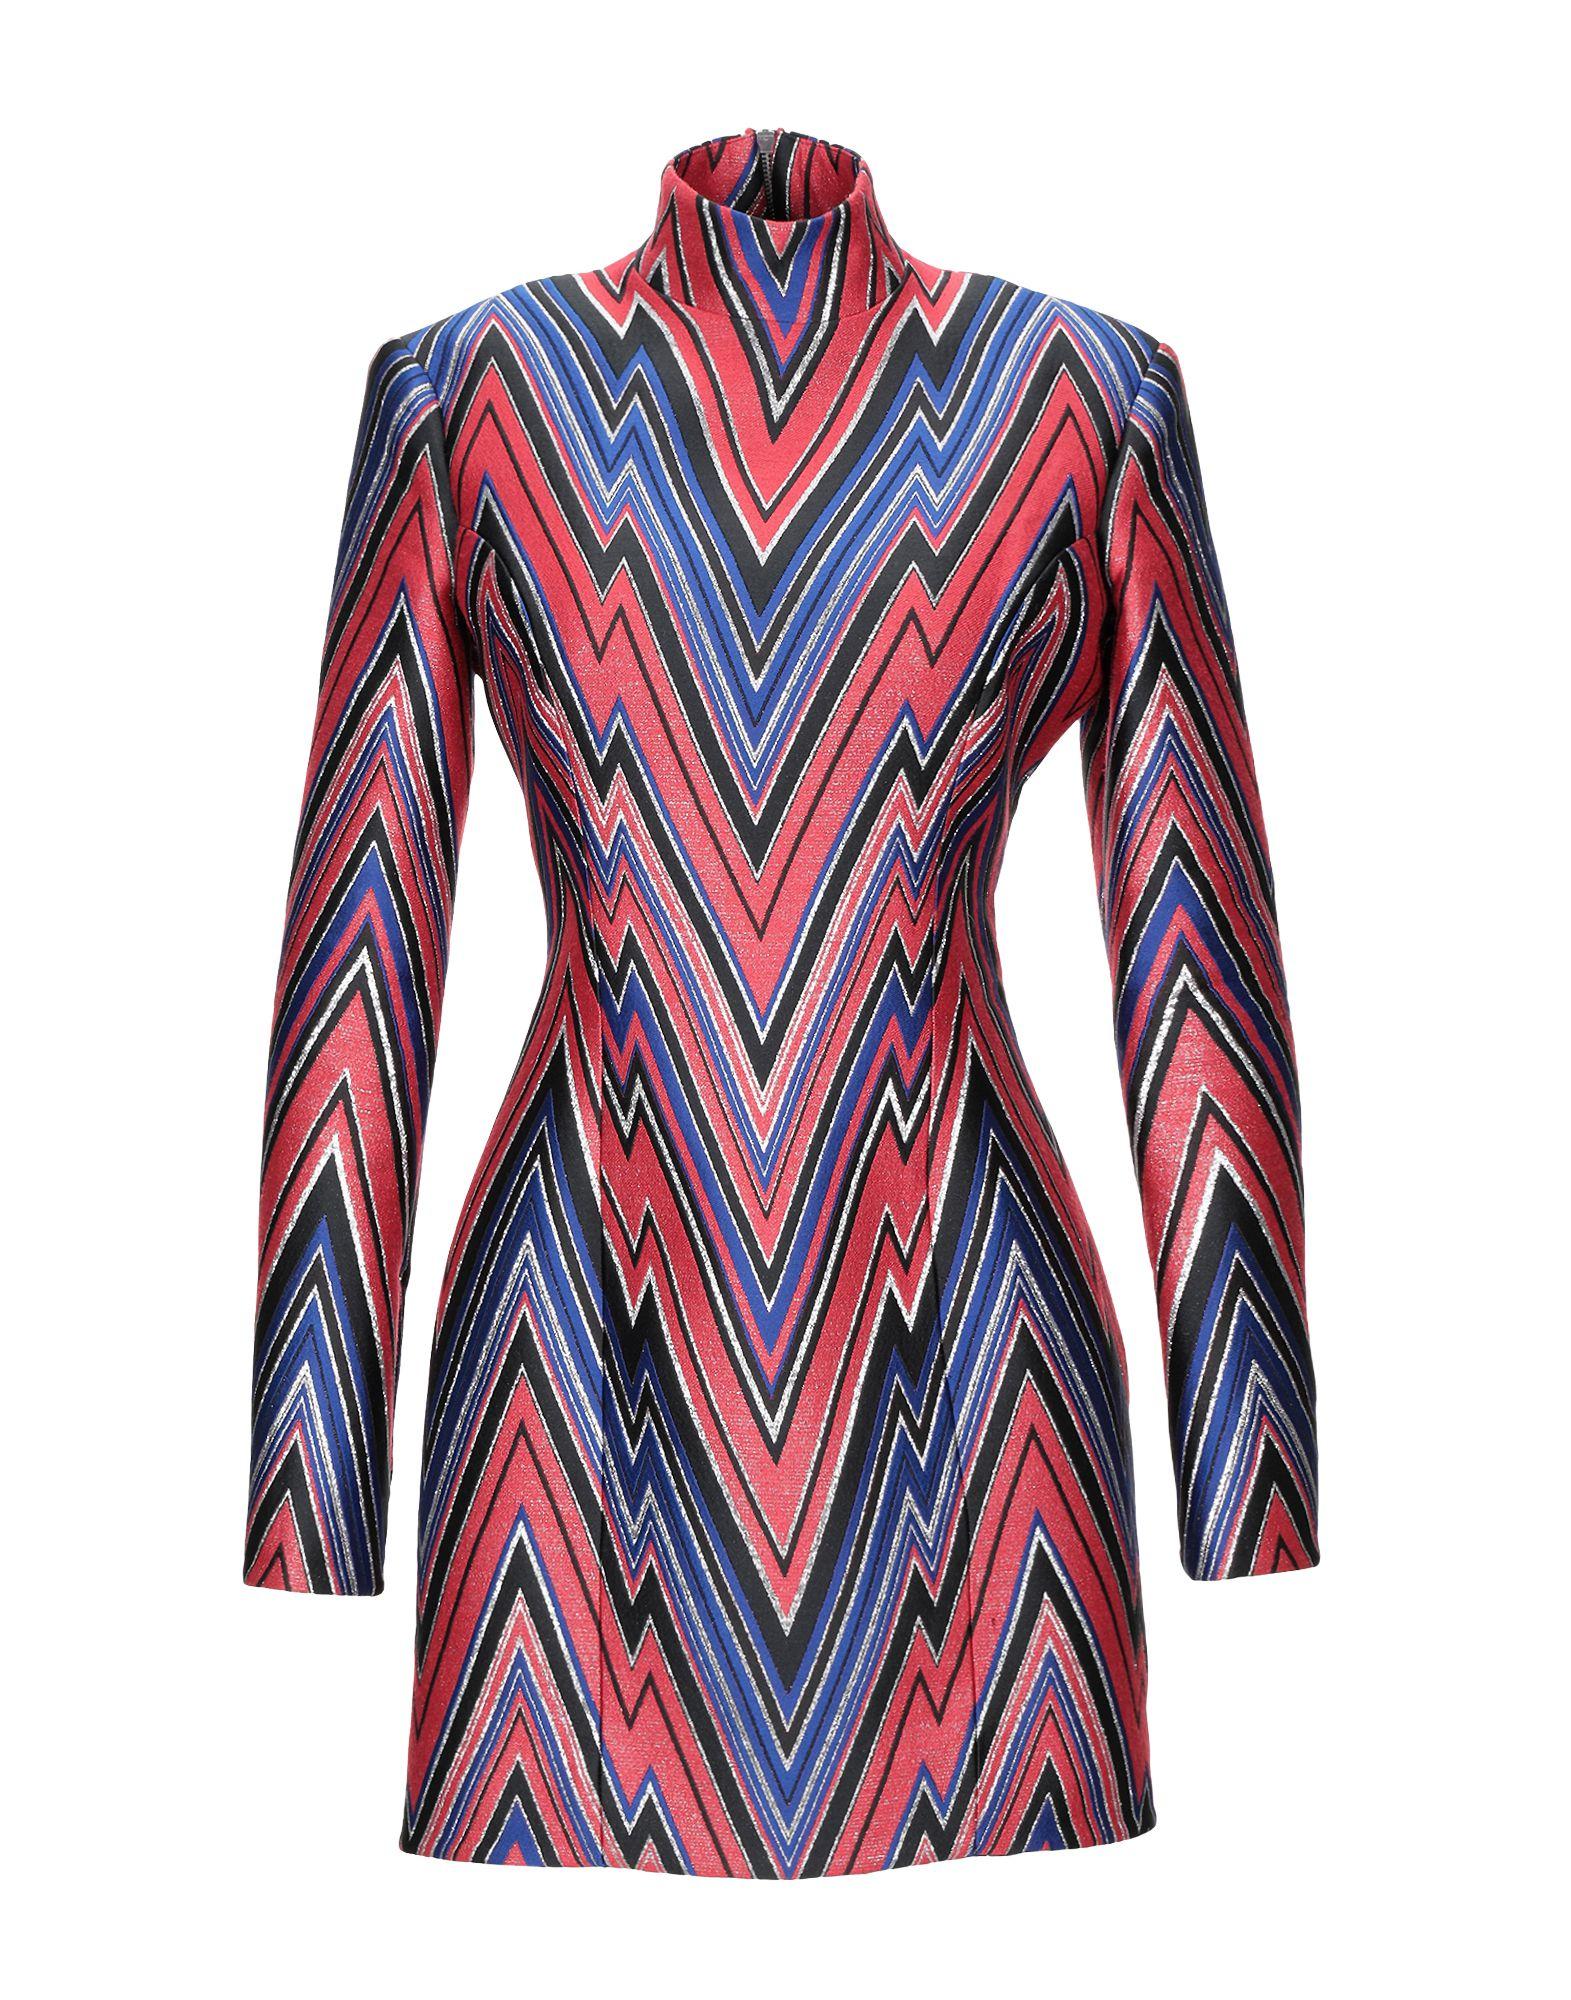 BALMAIN Short dresses. plain weave, lamé, no appliqués, optical pattern, turtleneck, long sleeves, no pockets, zipped cuffs, fully lined, rear closure. 81% Polyester, 7% Silk, 6% Metallic Polyester, 6% Polyamide, Viscose